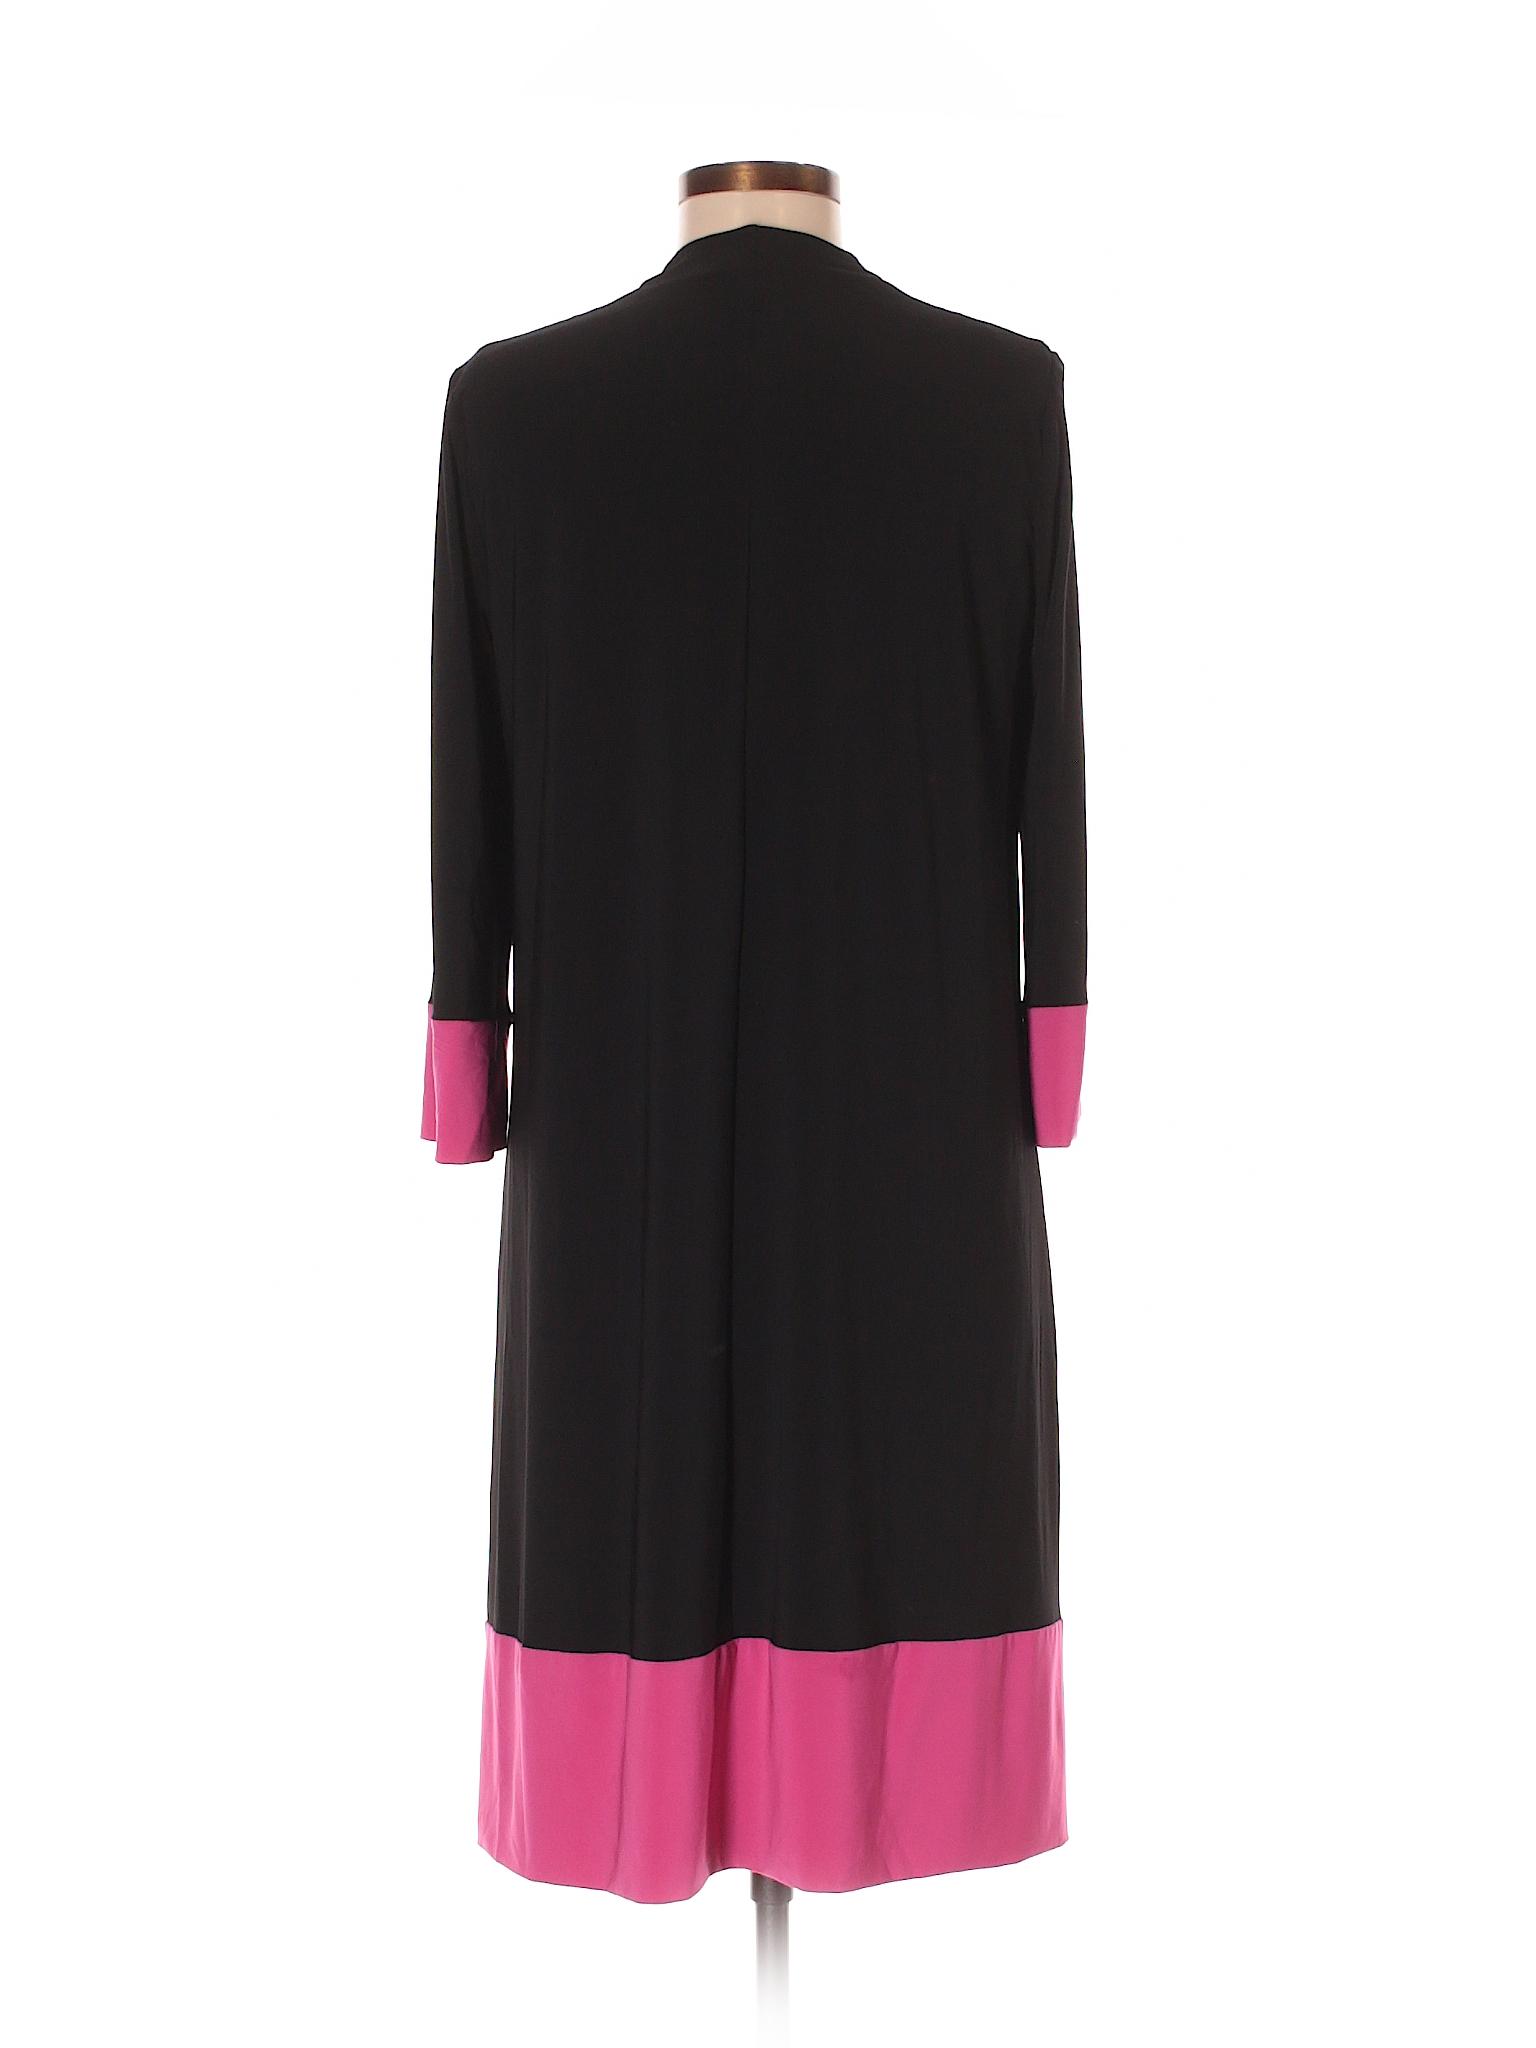 Jones Casual New Winter York Dress Boutique Y65qT